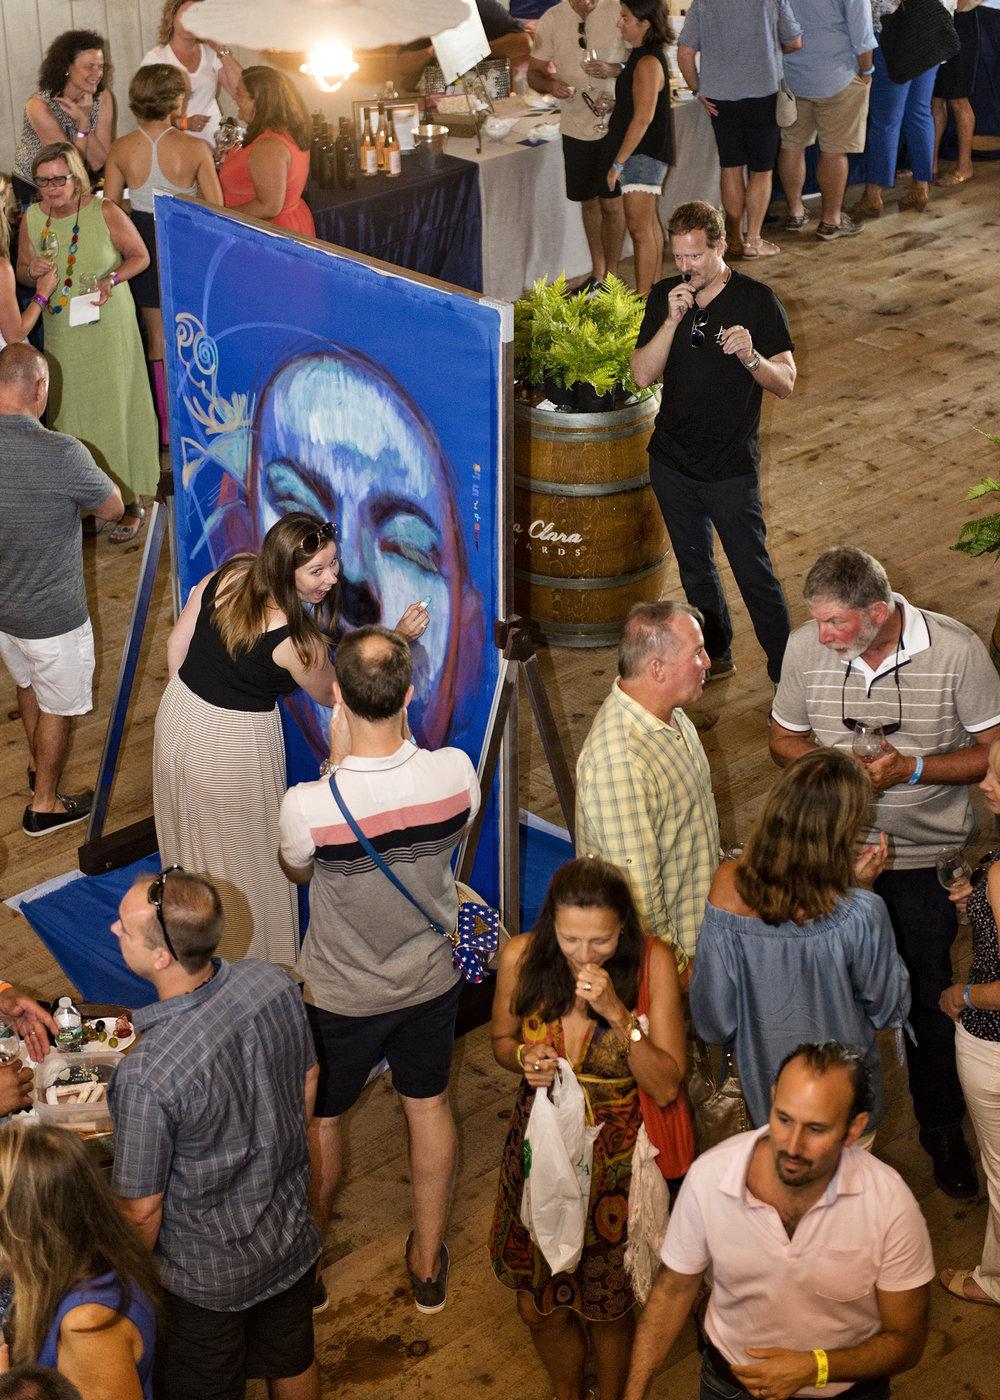 STYLE: Portrait   TITLE:Harvest Wine Festival